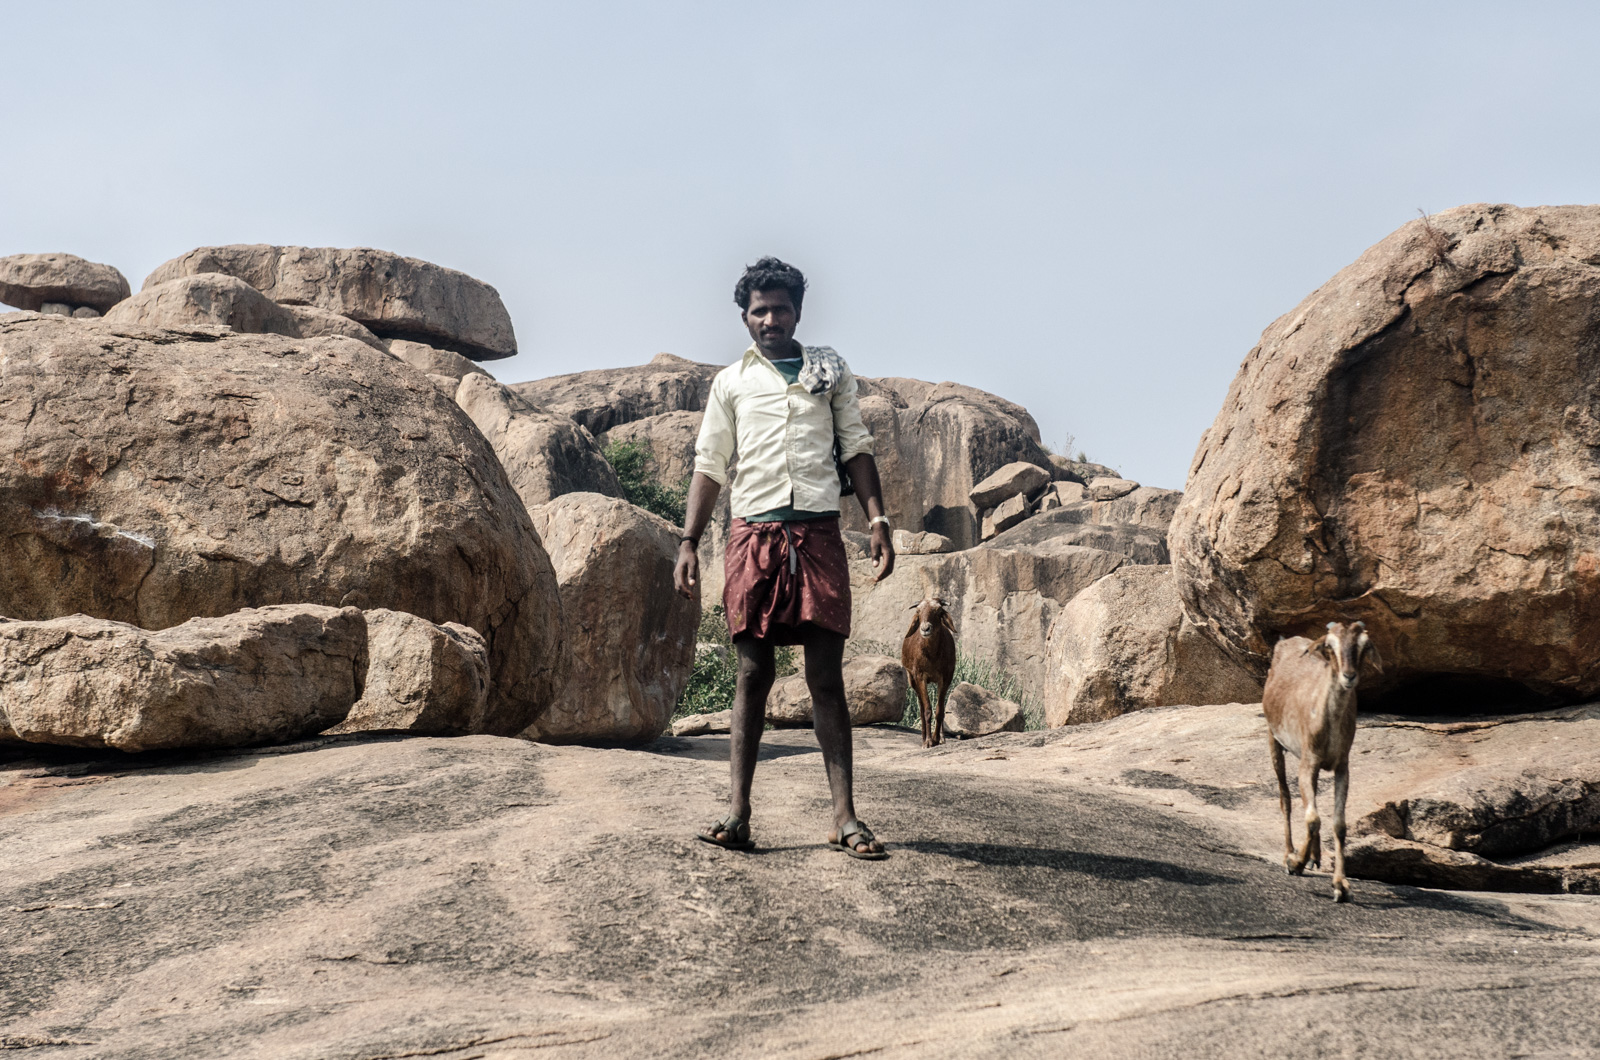 Hampi-India-bouldering-rockclimbing-AmyRolloPhoto-0946.jpg